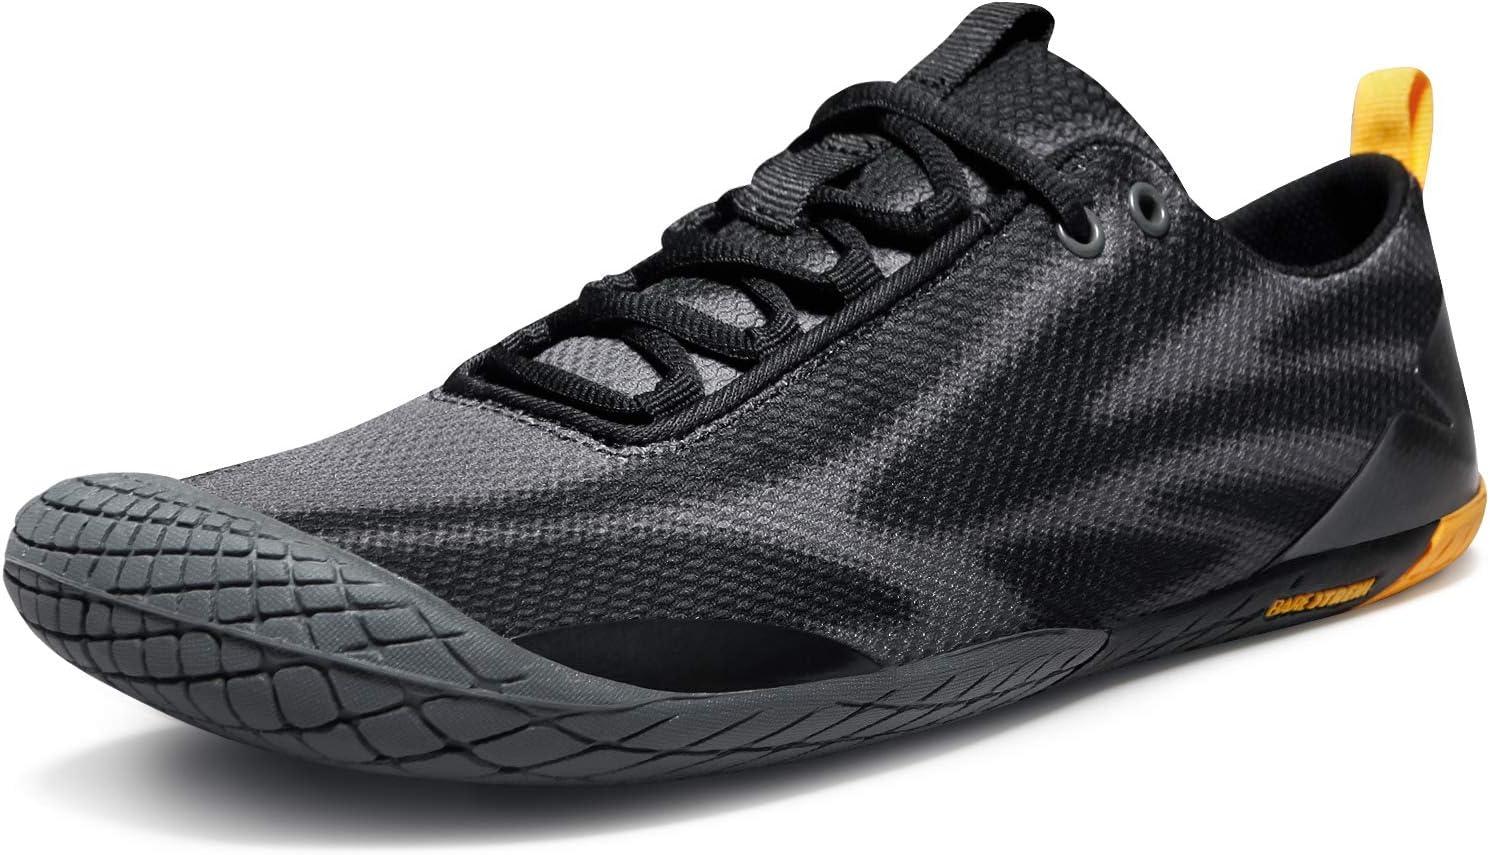 Albuquerque Mall TSLA Men's Trail Running Shoes Lightweight Athletic B Zero Fort Worth Mall Drop